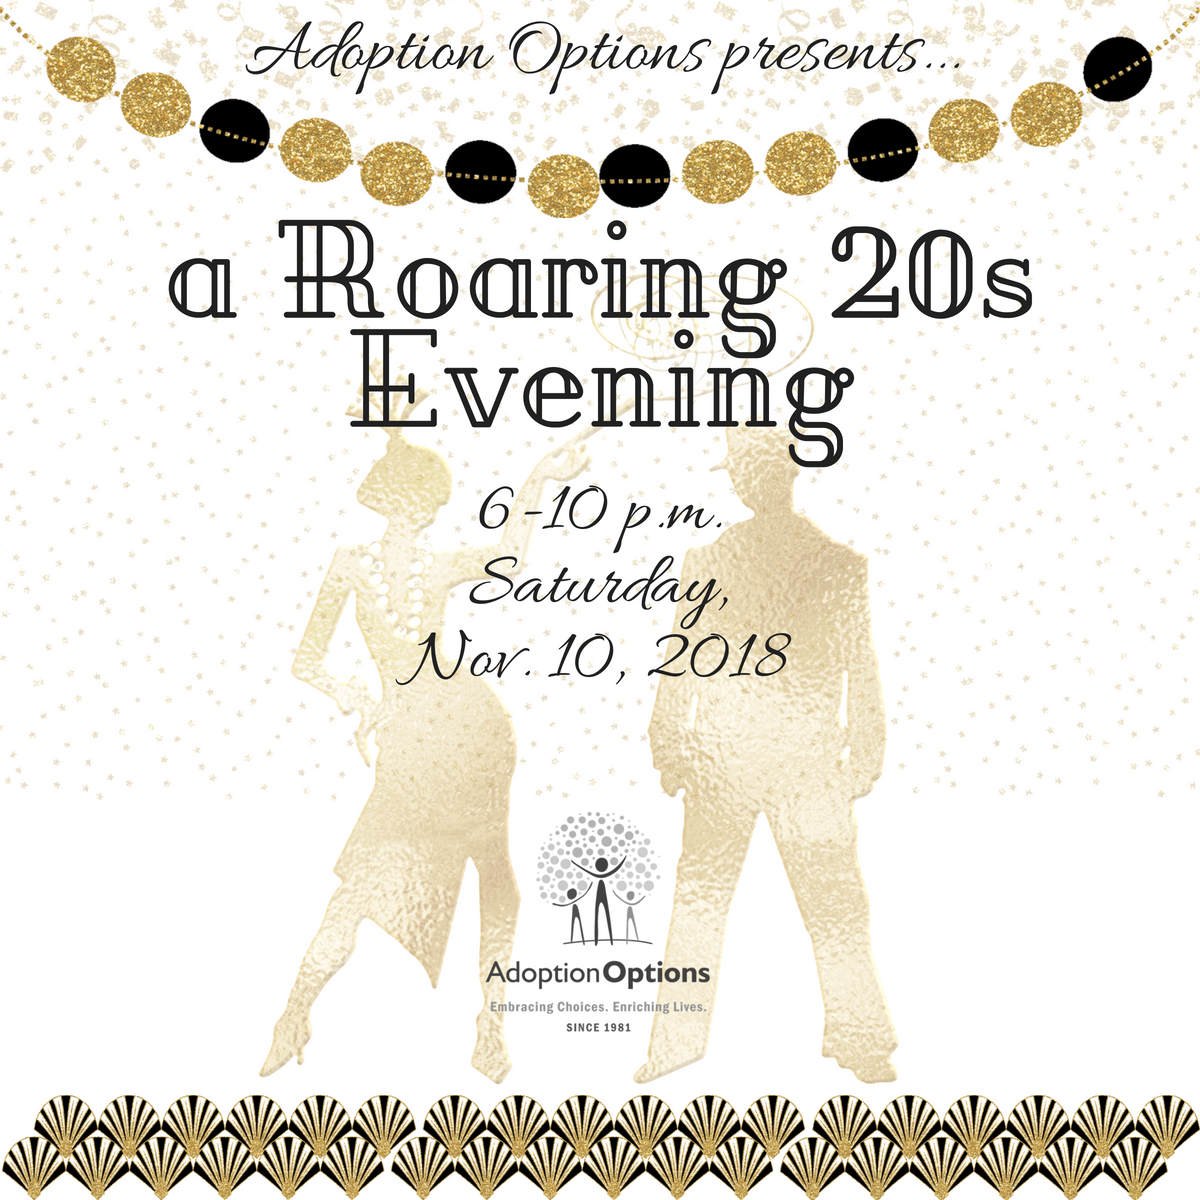 Roaring 20s logo